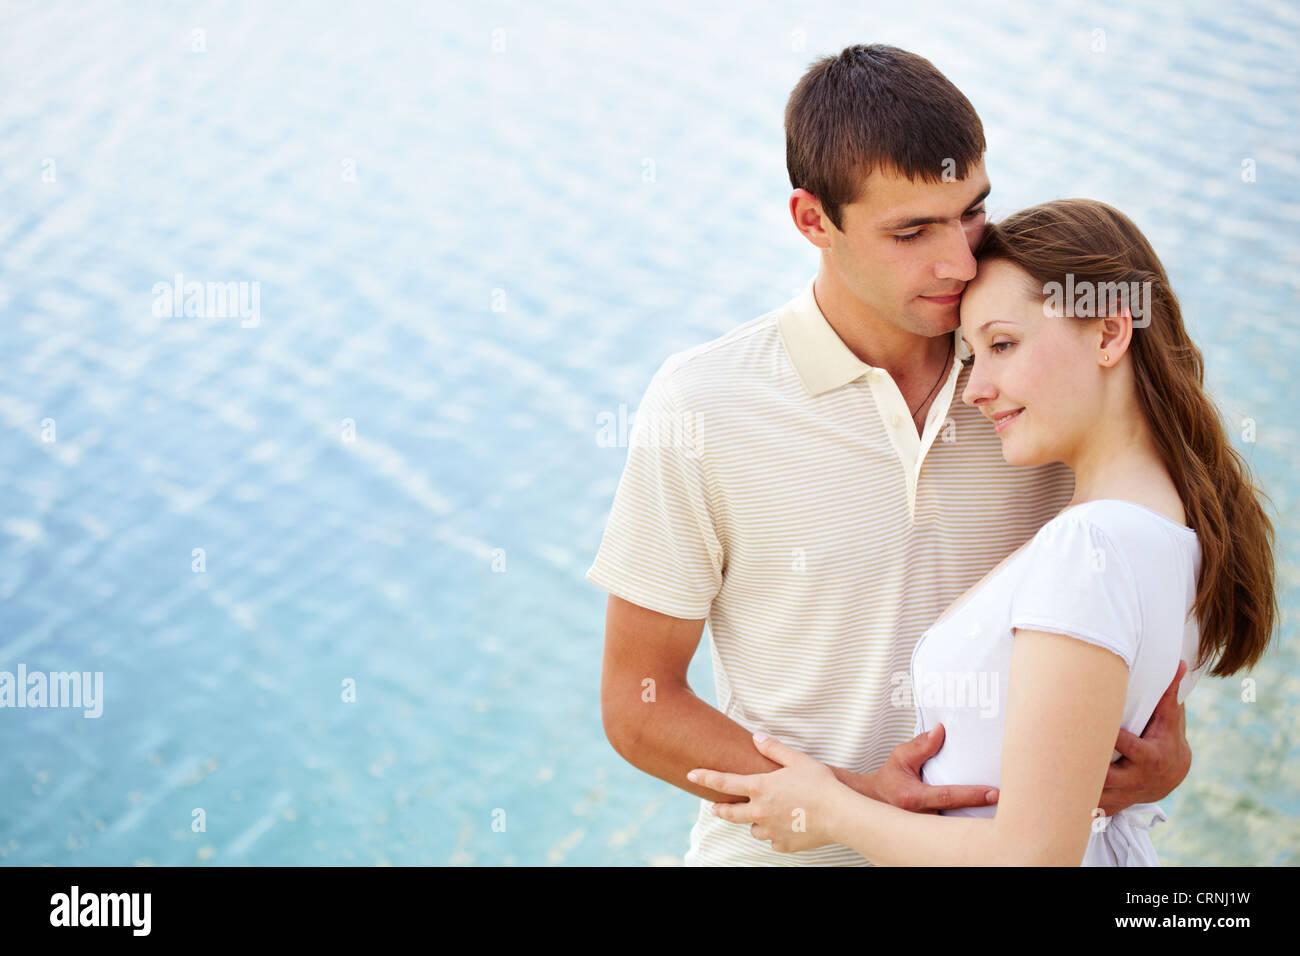 Guy embracing tenderly his girlfriend - Stock Image